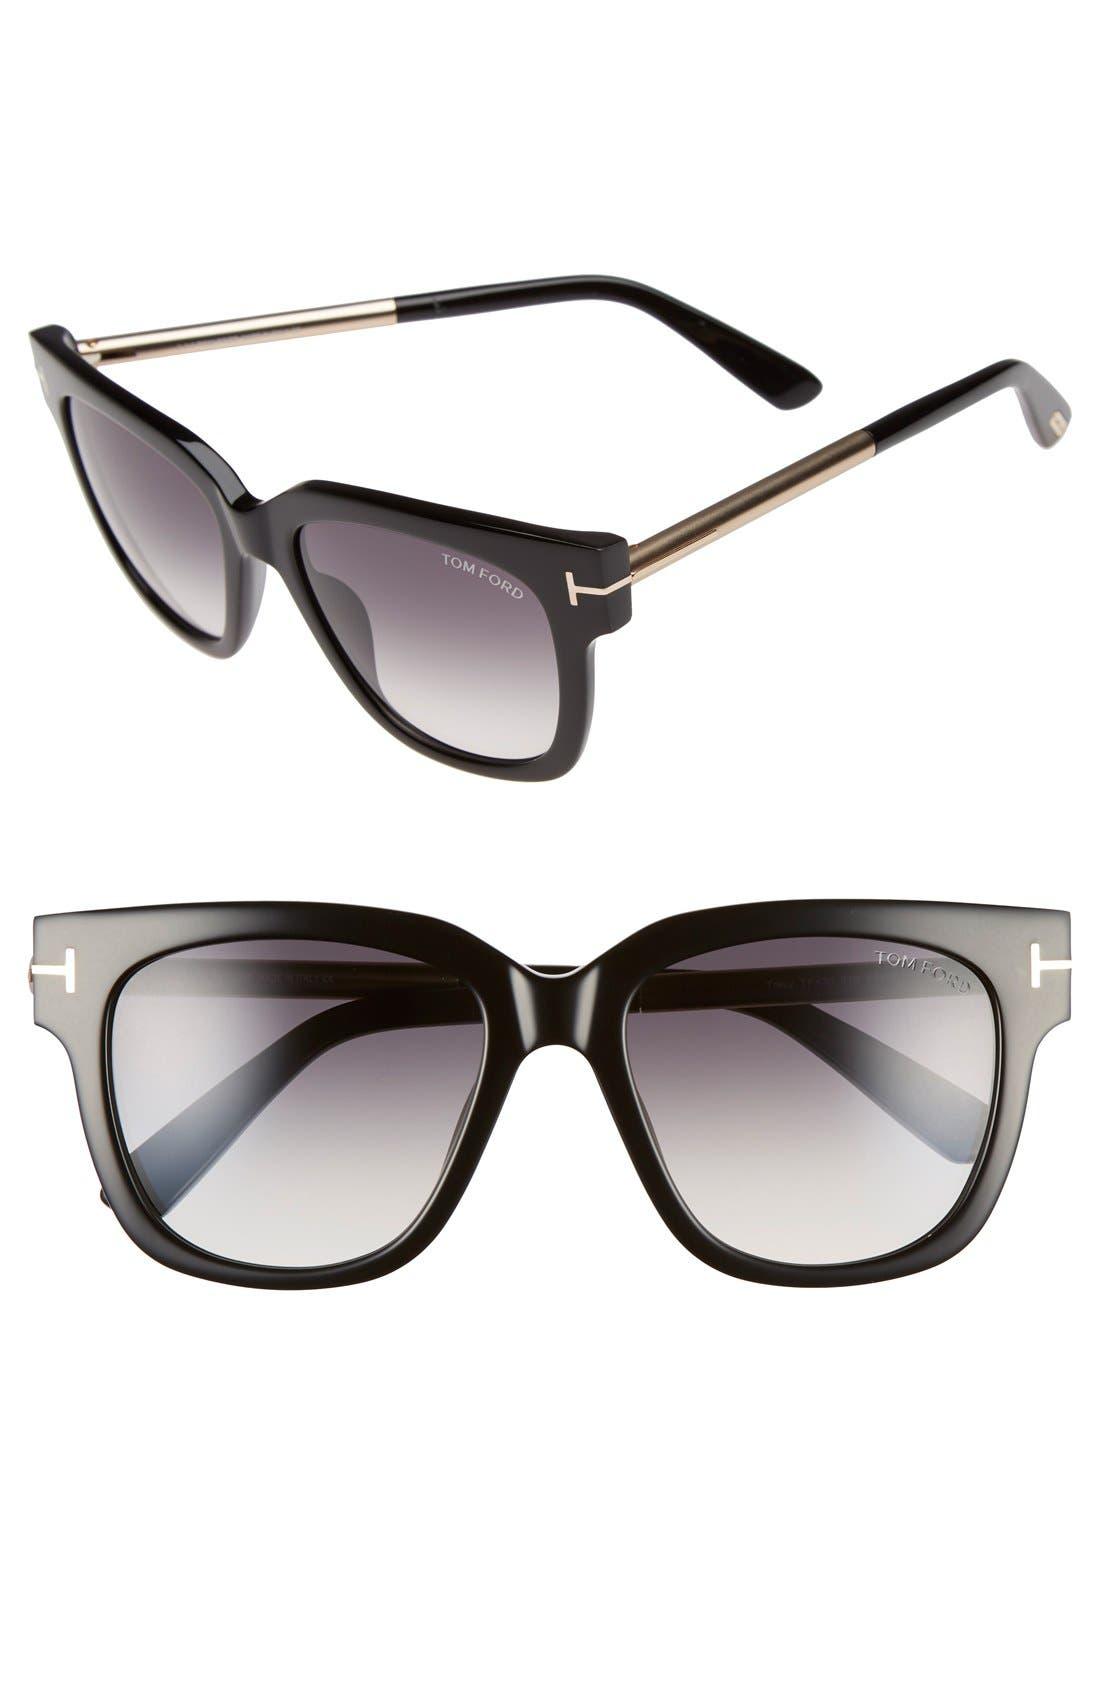 TOM FORD Tracy 53mm Retro Sunglasses